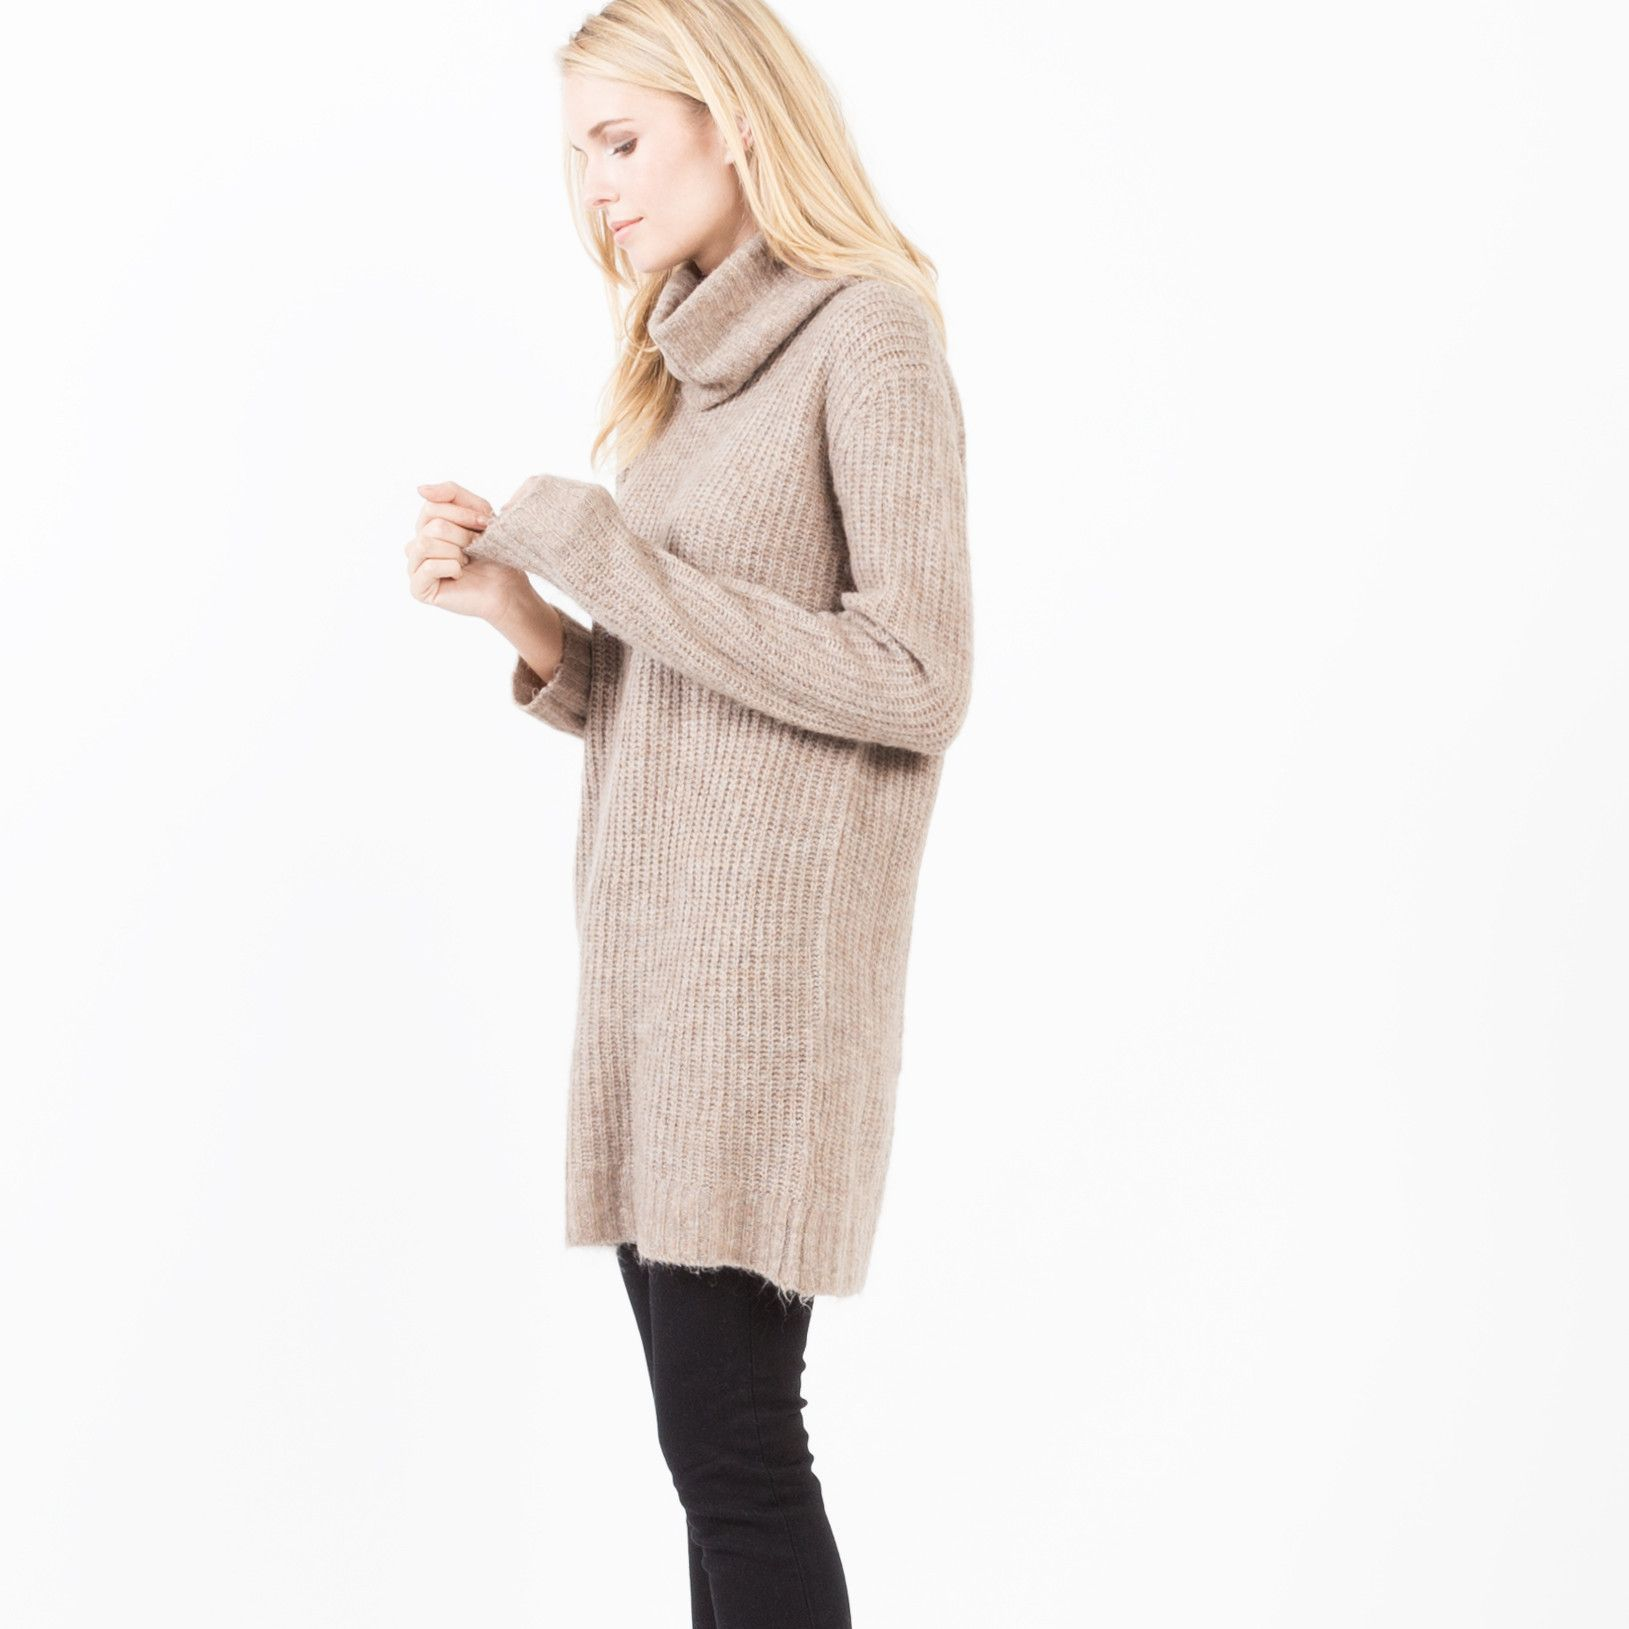 Modern Citizen | Noa Turtleneck Tunic Sweater (Camel) $92 | Style ...